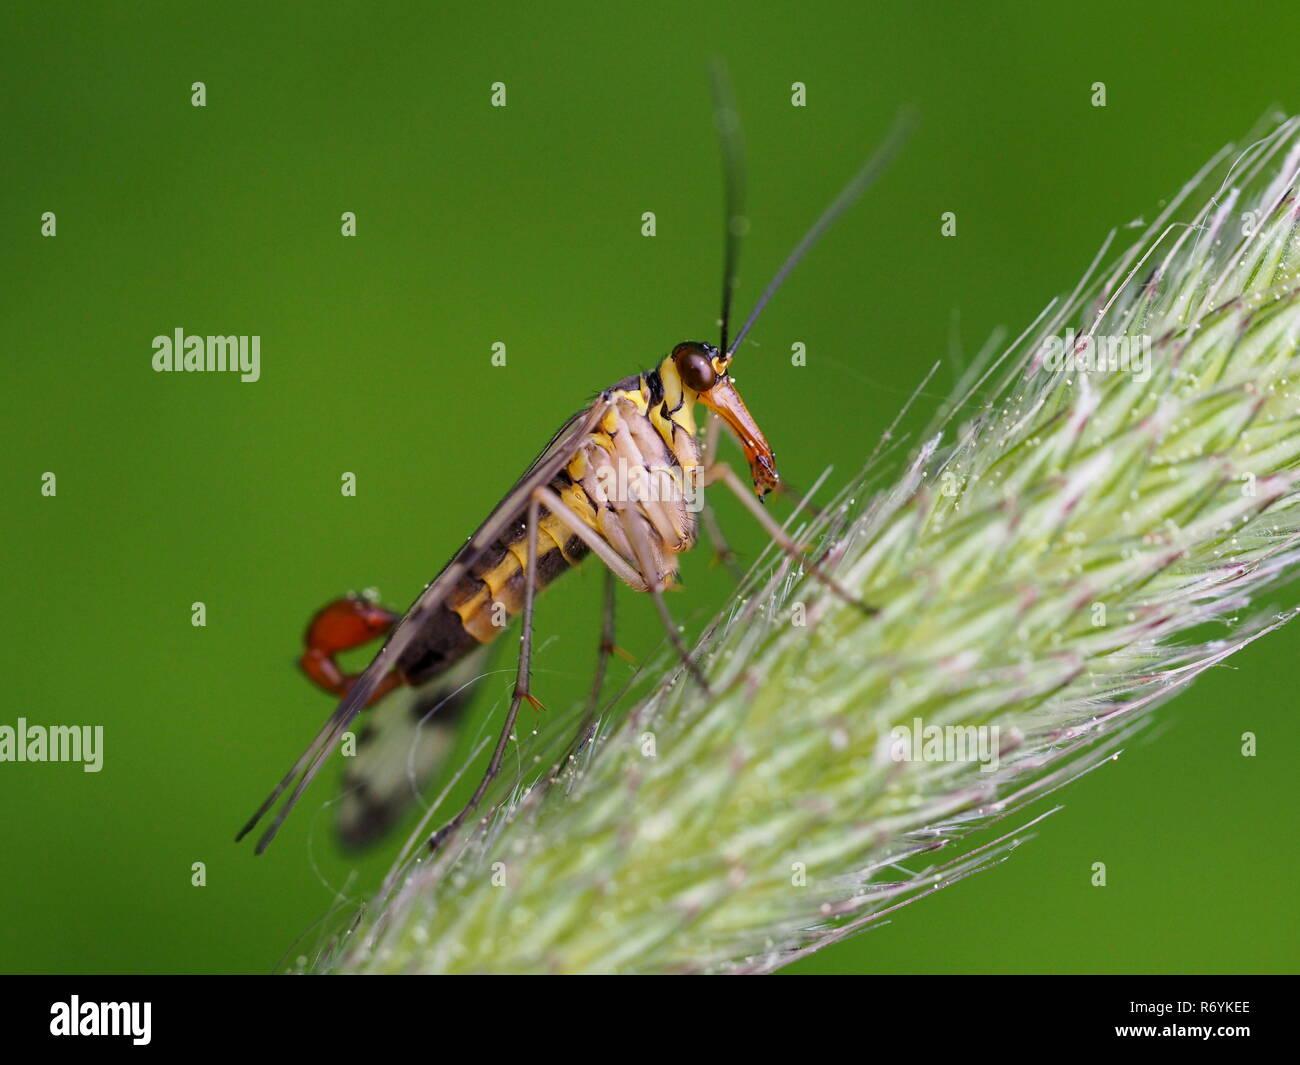 skorpionsfliege - Stock Image